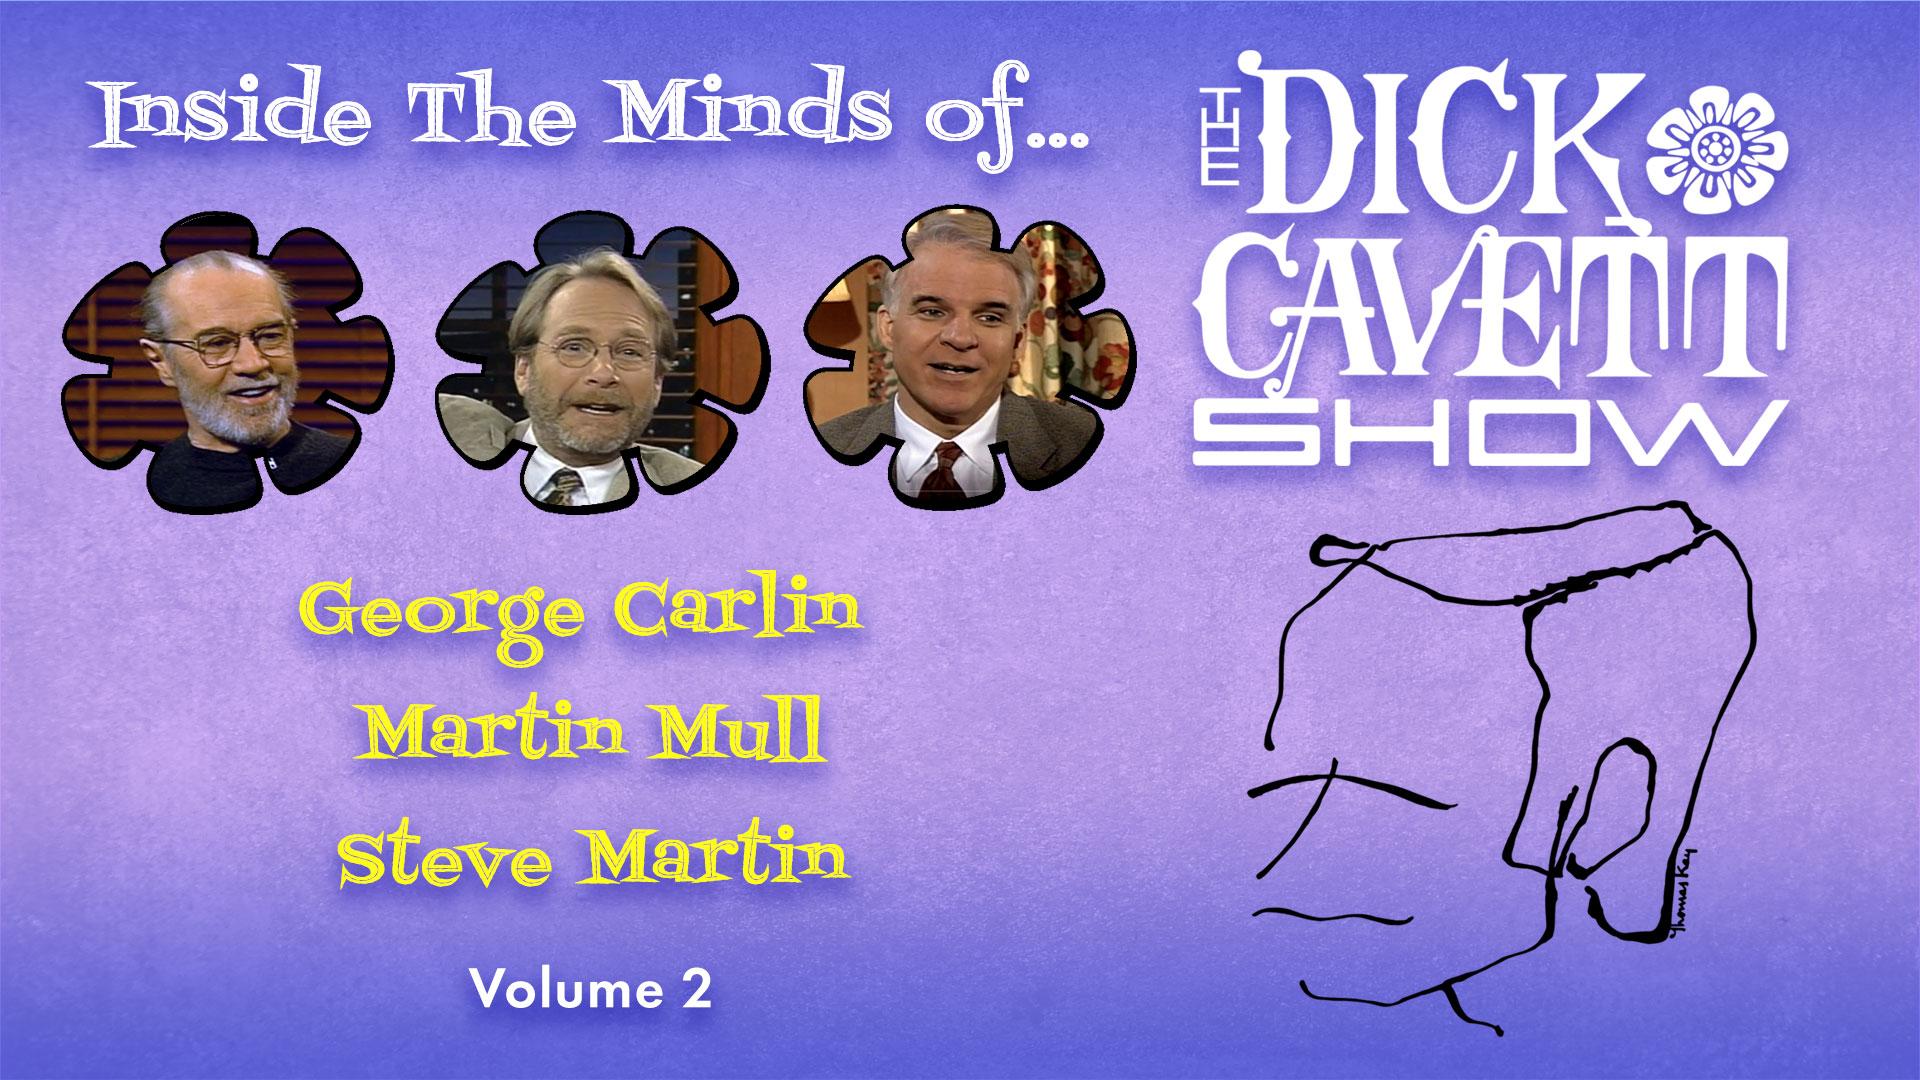 Dick Cavett Show: Inside The Minds Of: Vol. 2